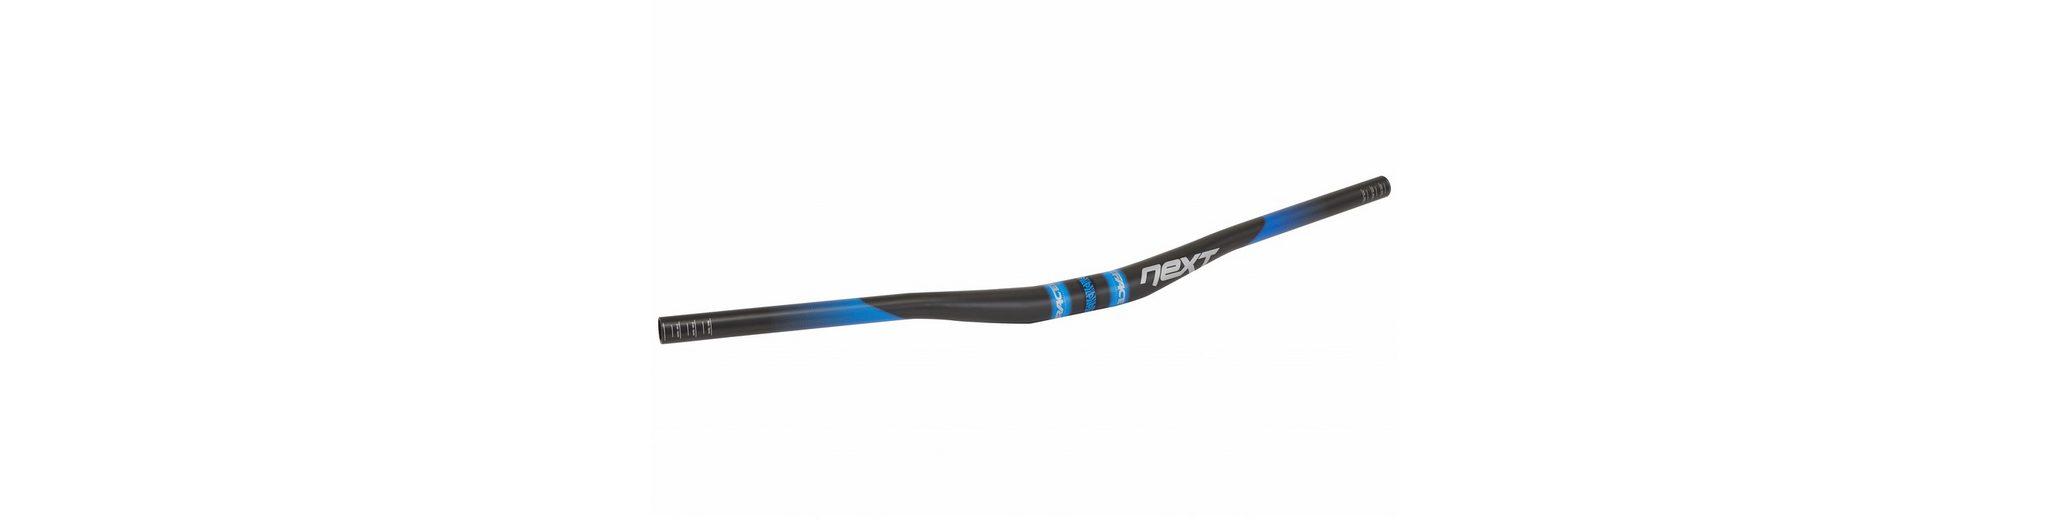 Race Face Lenker & Barends »Next 3/4 Riser 725 mm Ø31.8 mm Carbon blau«